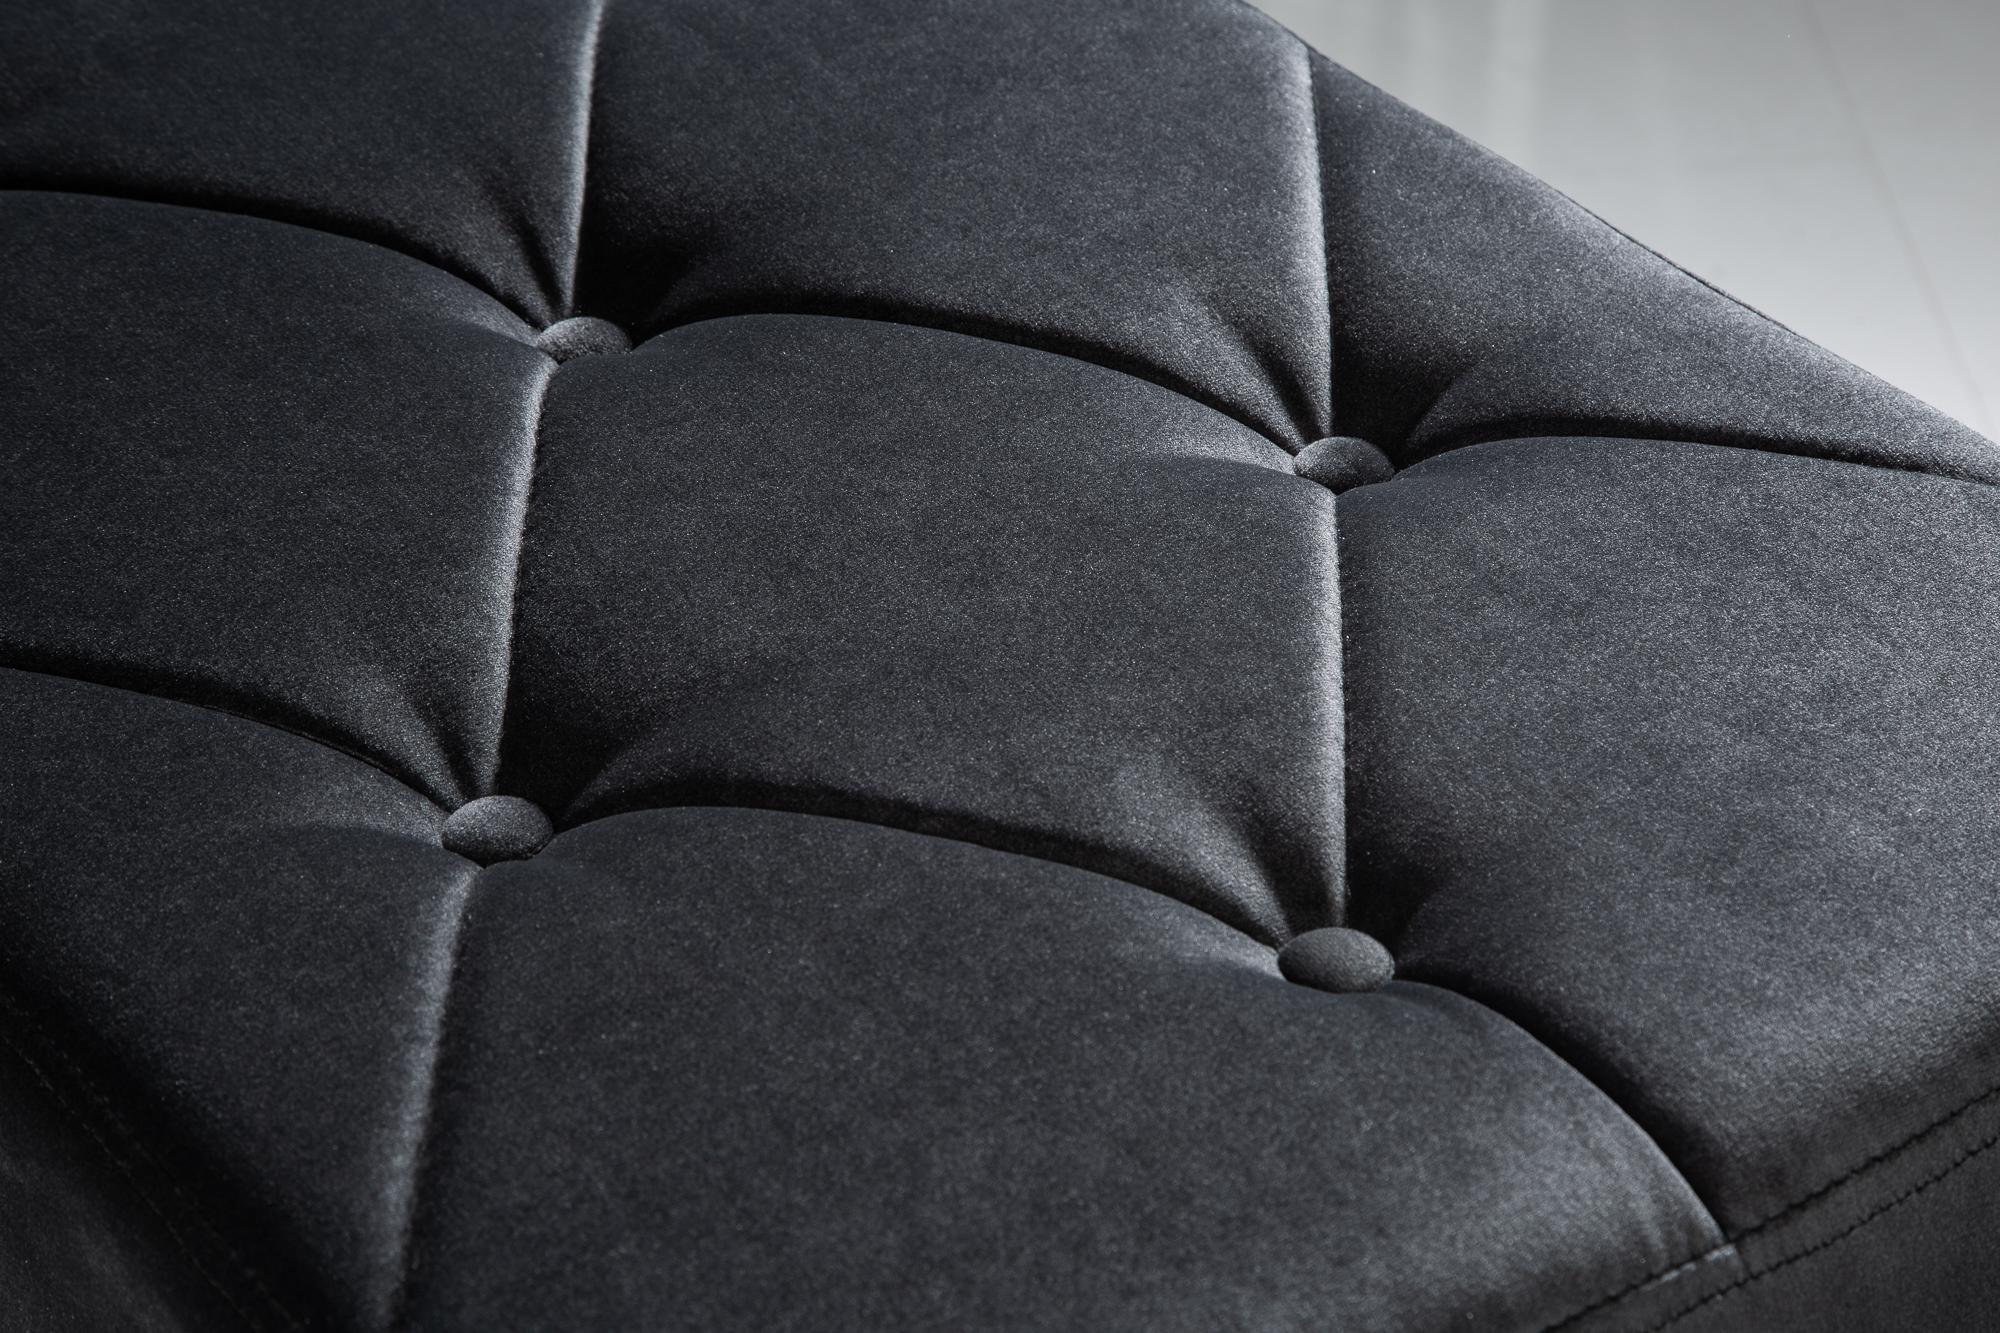 Bänk Modern barock 170cm svart | Norrköping Max Möbler